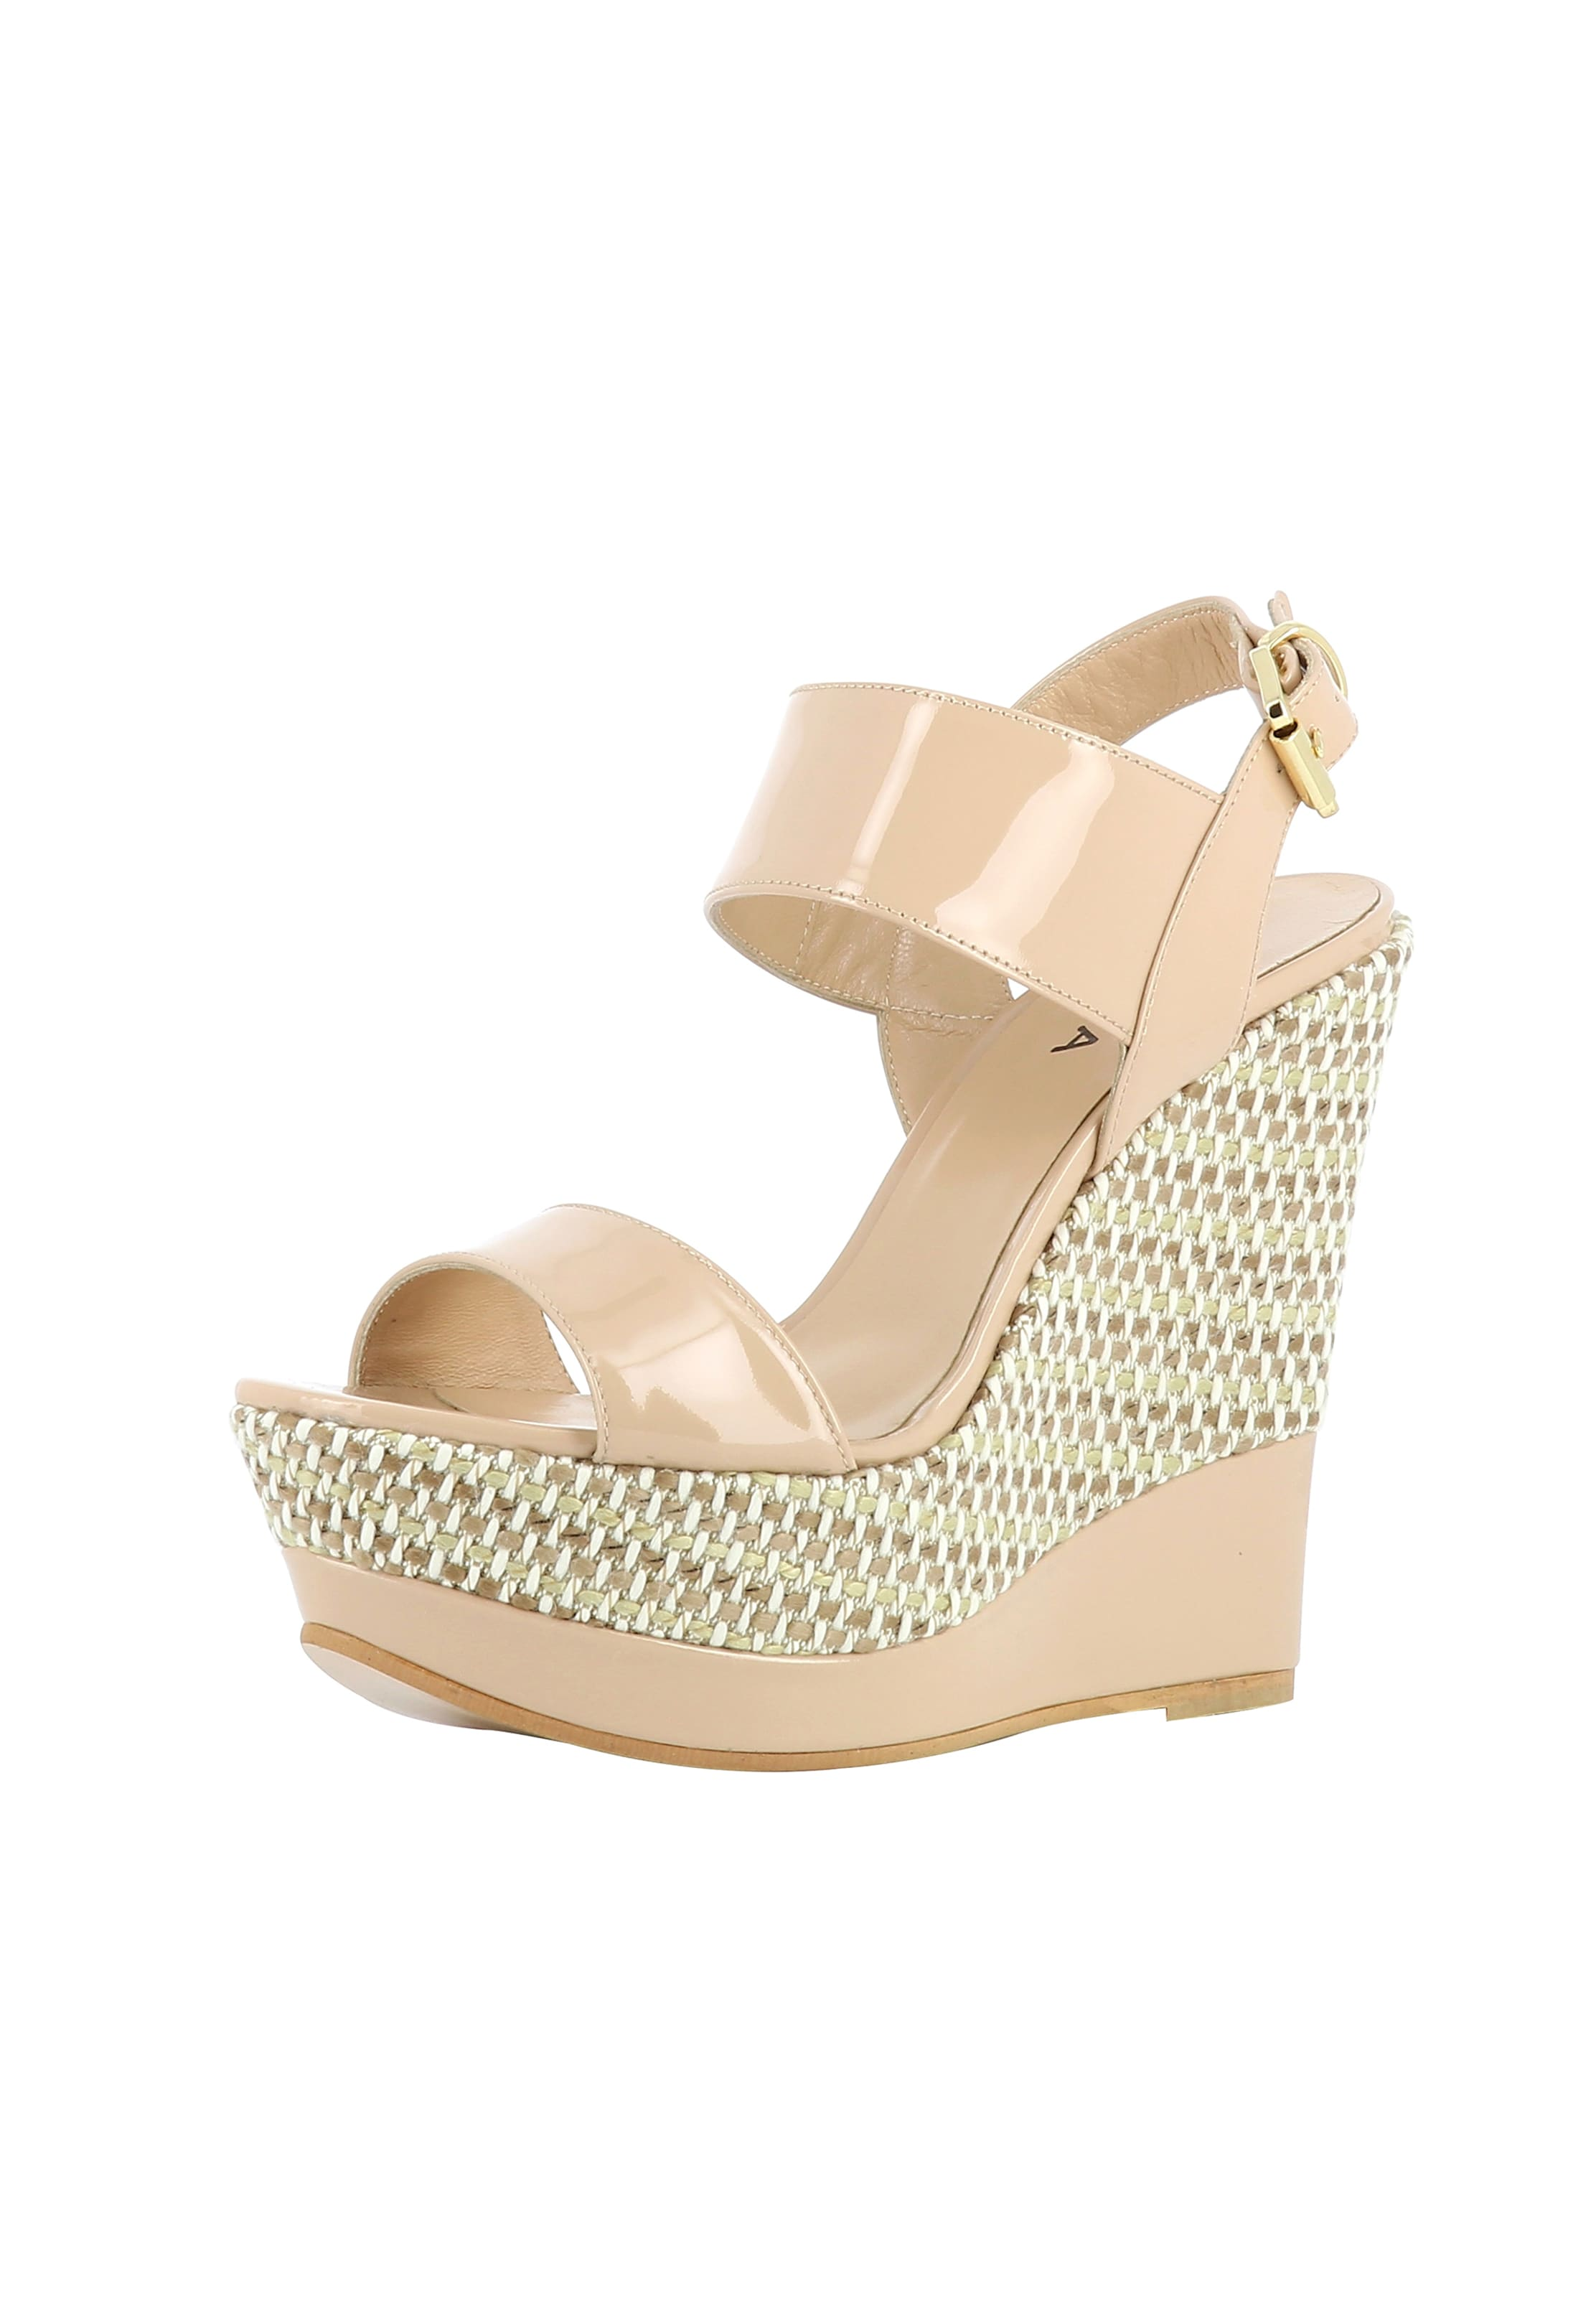 EVITA Damen Damen EVITA Sling Peeptoe Verschleißfeste billige Schuhe ce9ba9